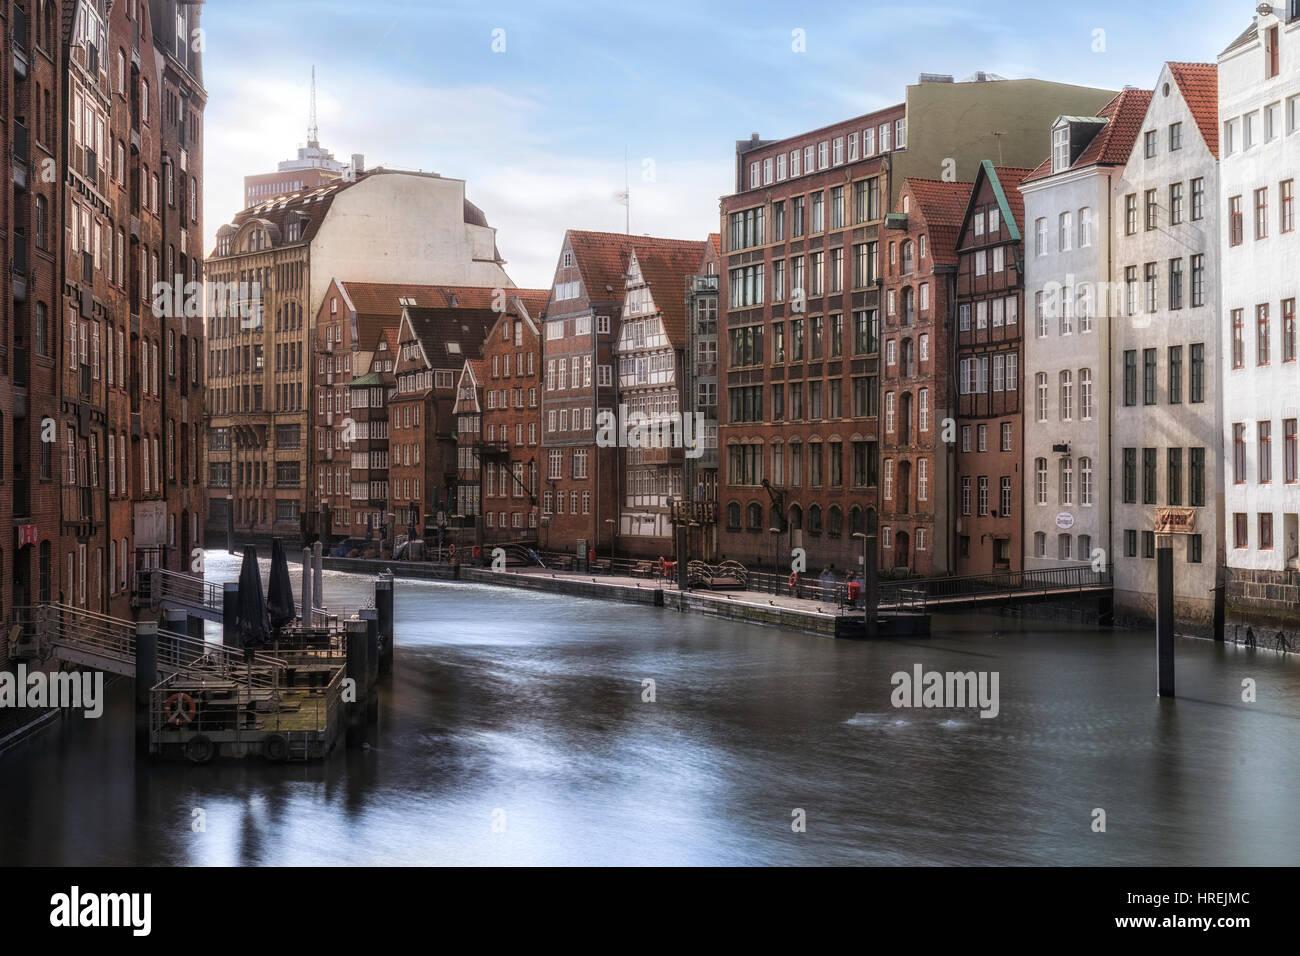 Nikolaifleet, Hamburg, Germany, Europe - Stock Image